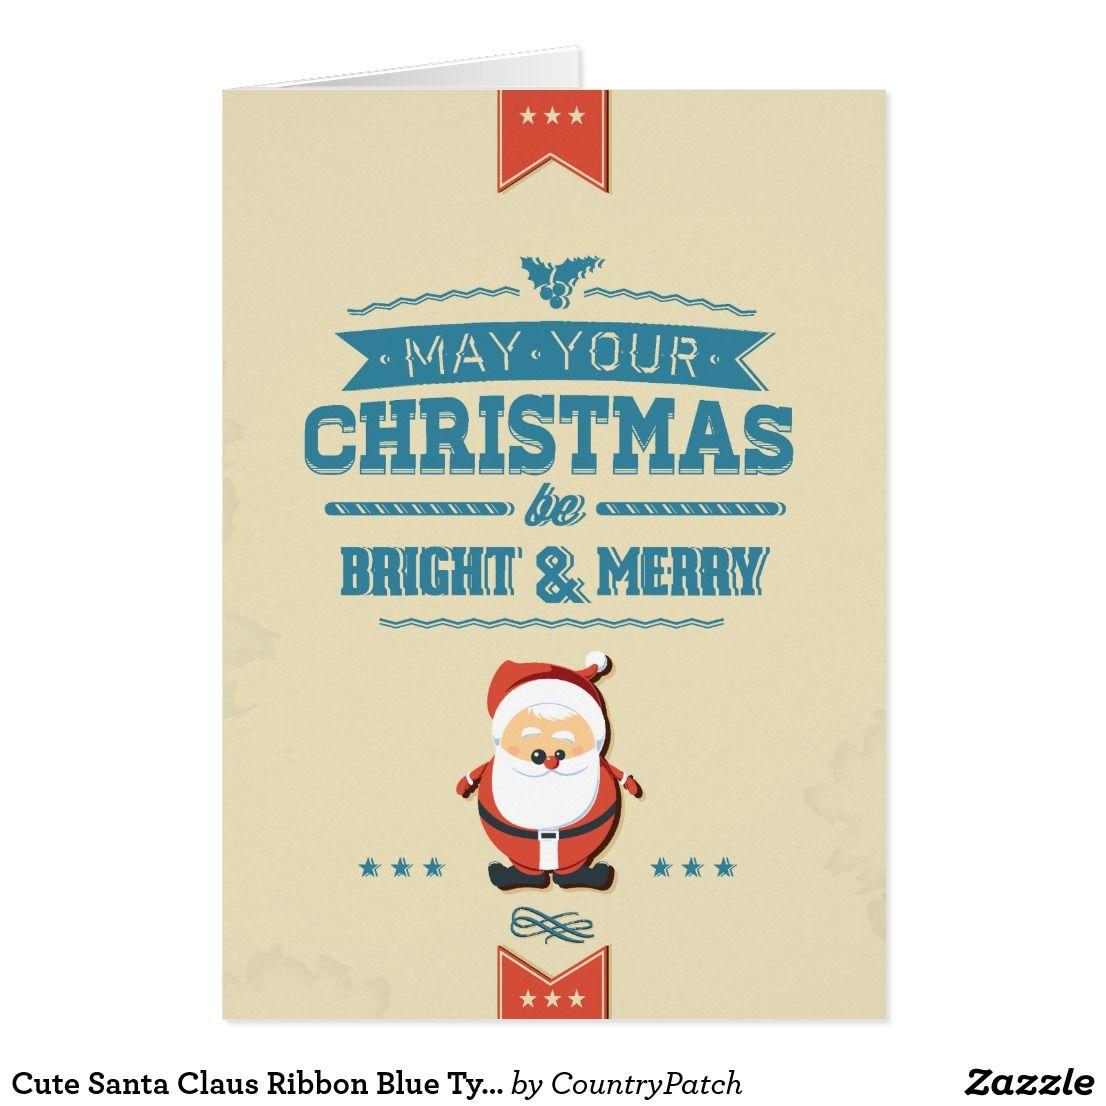 Cute Santa Claus Ribbon Blue Typographic Custom Christmas